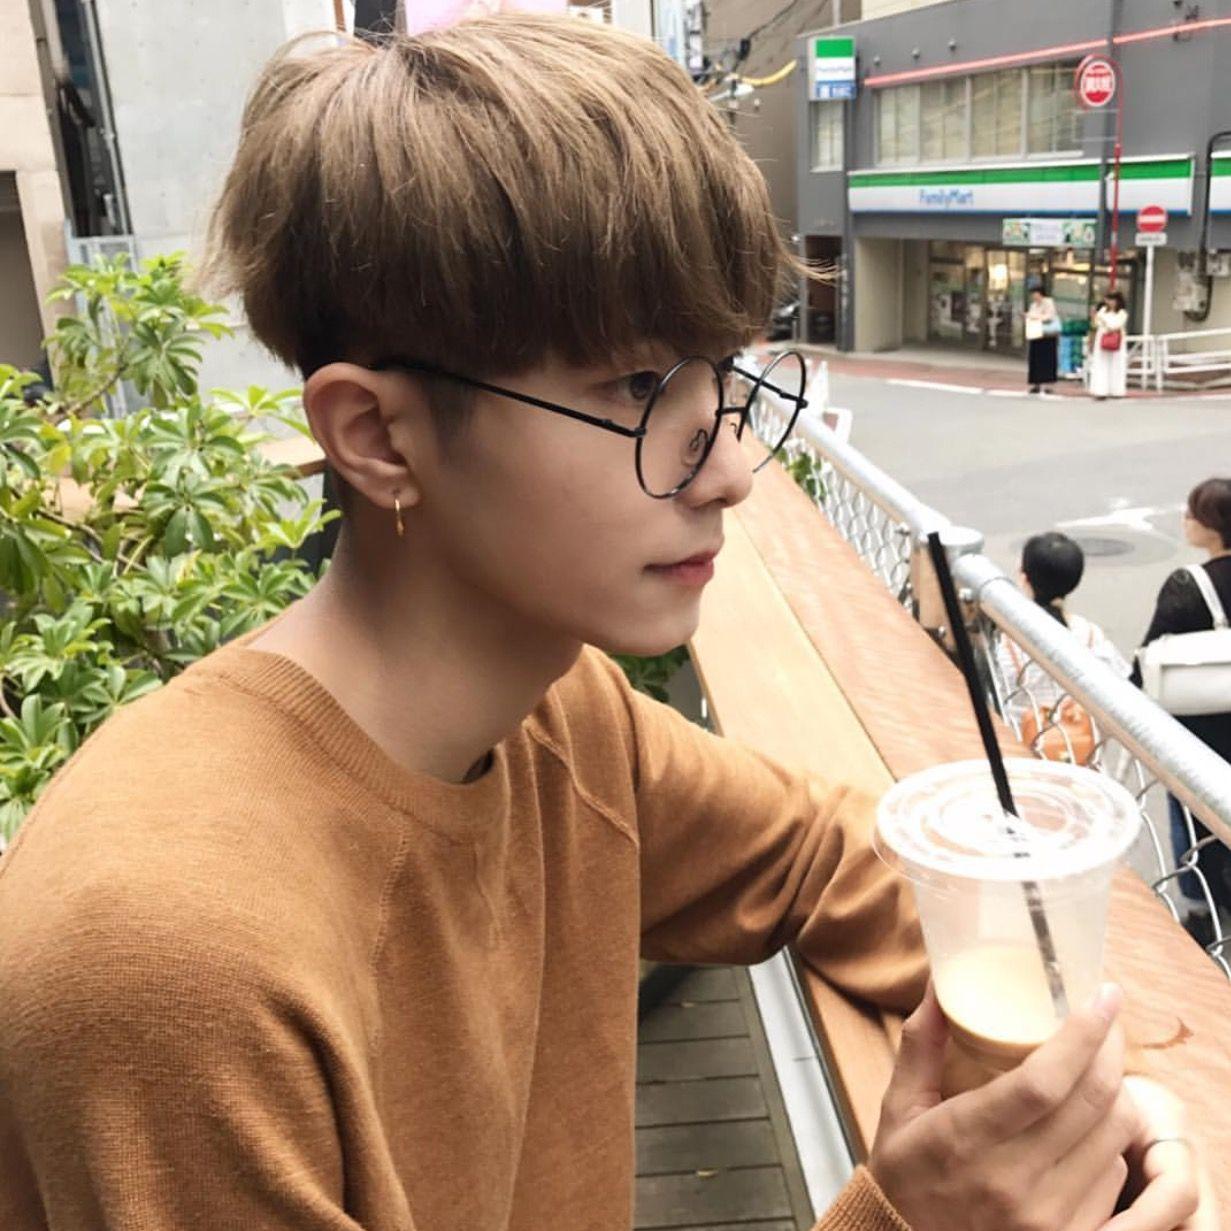 98 Shin B Tch Who Pinterest Ulzzang Ulzzang Boy And Korean